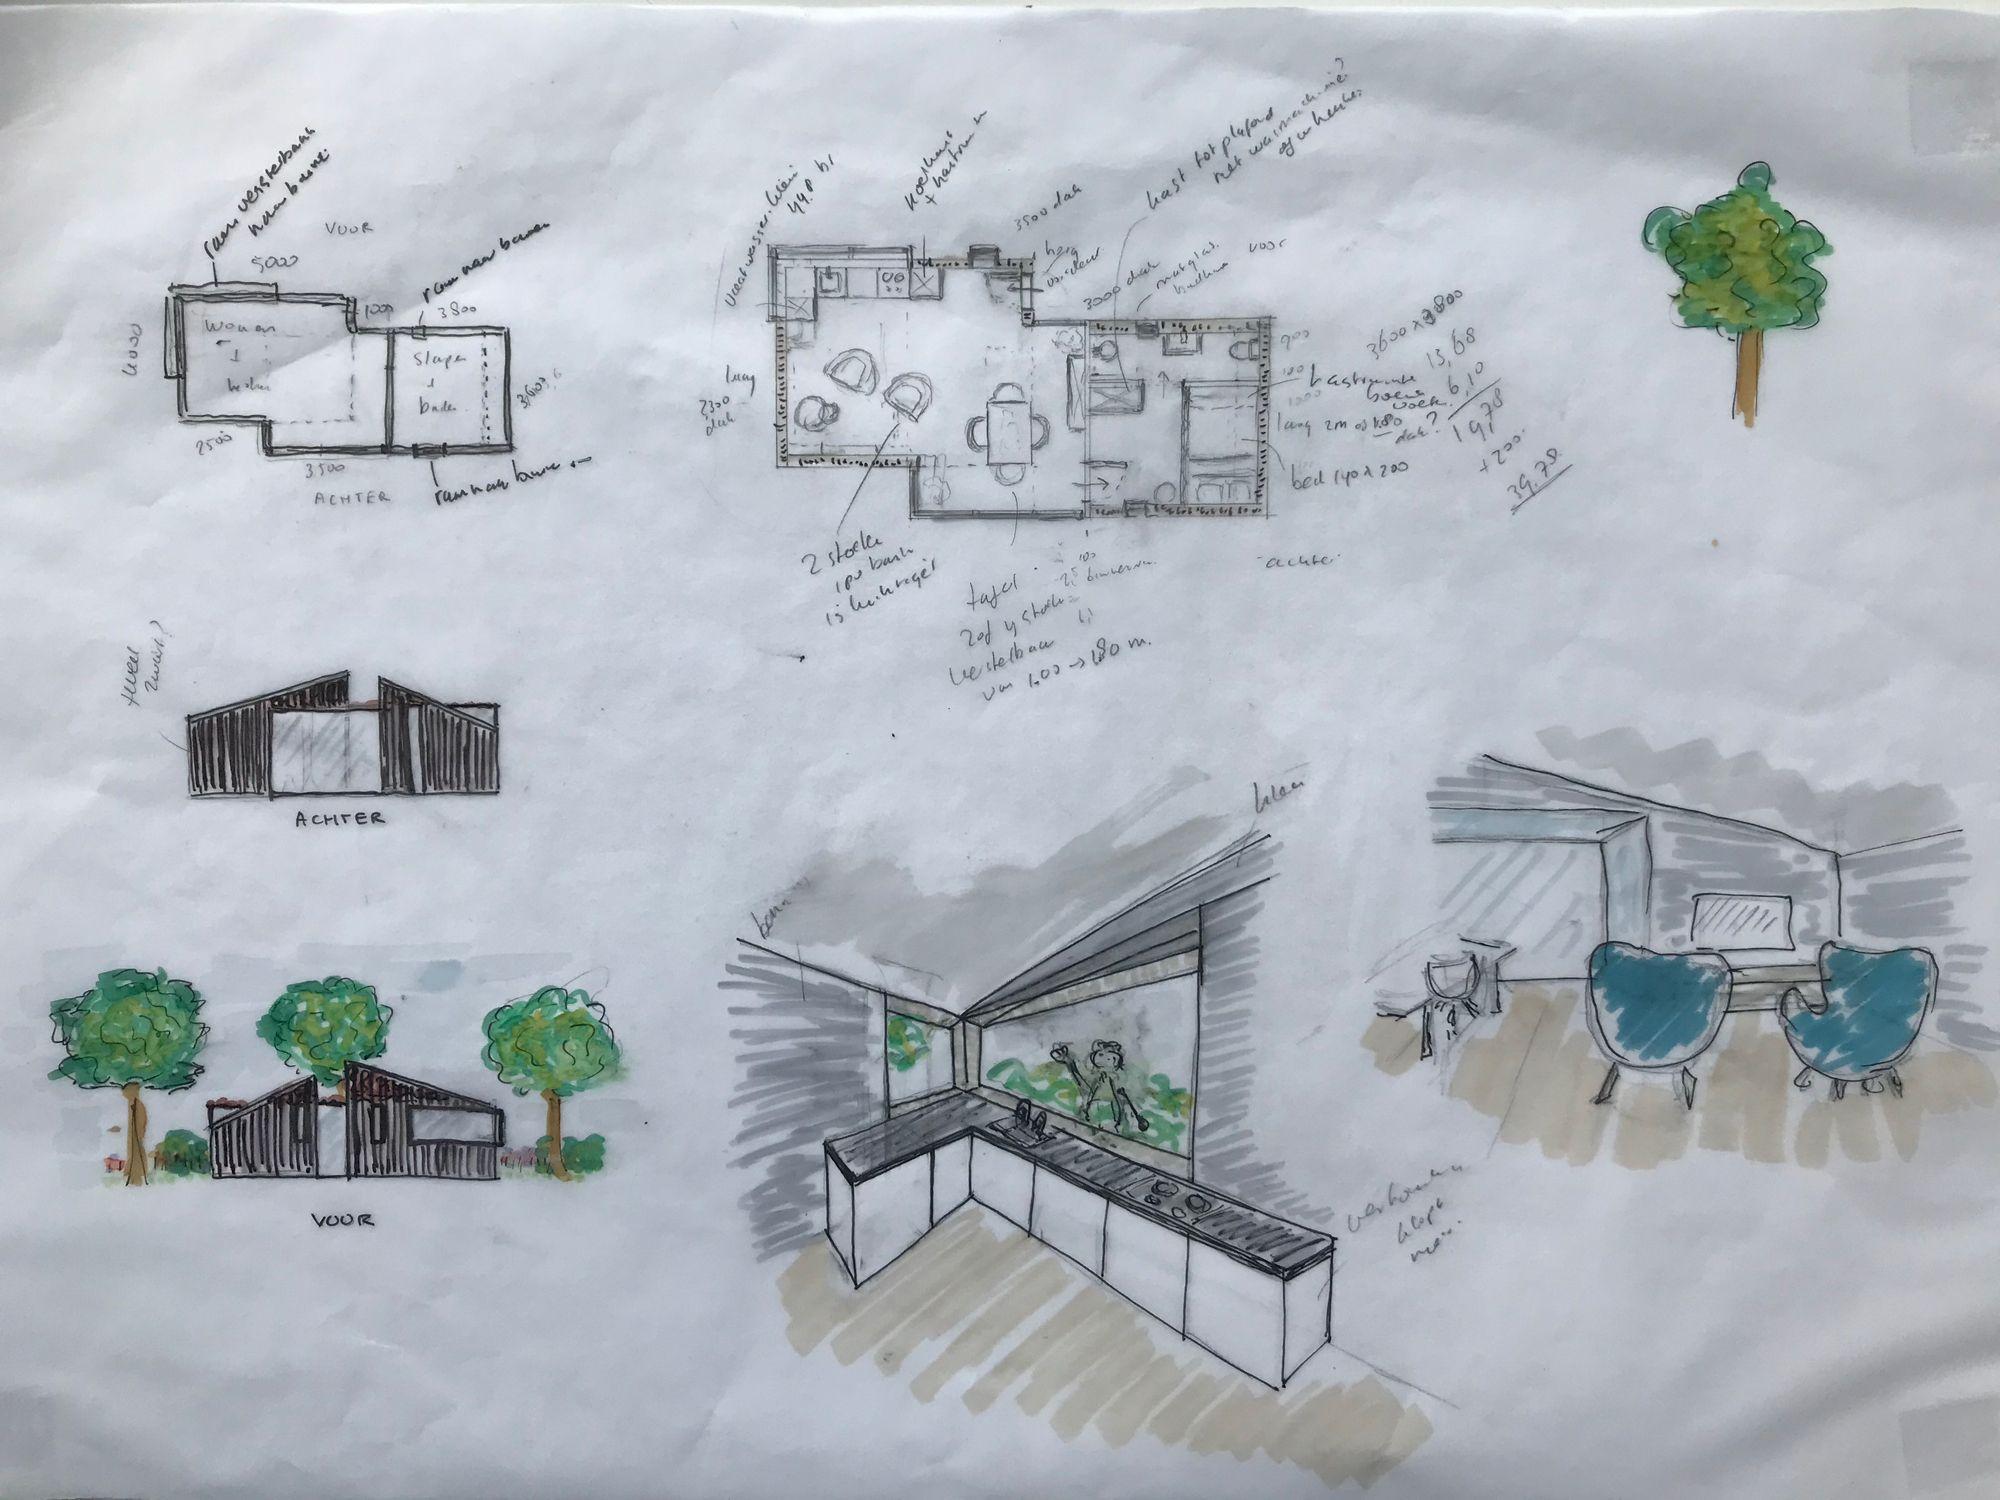 Project compact wonen schets Interieur project compact wonen | Space identity | Interieurvormgeving Tiel